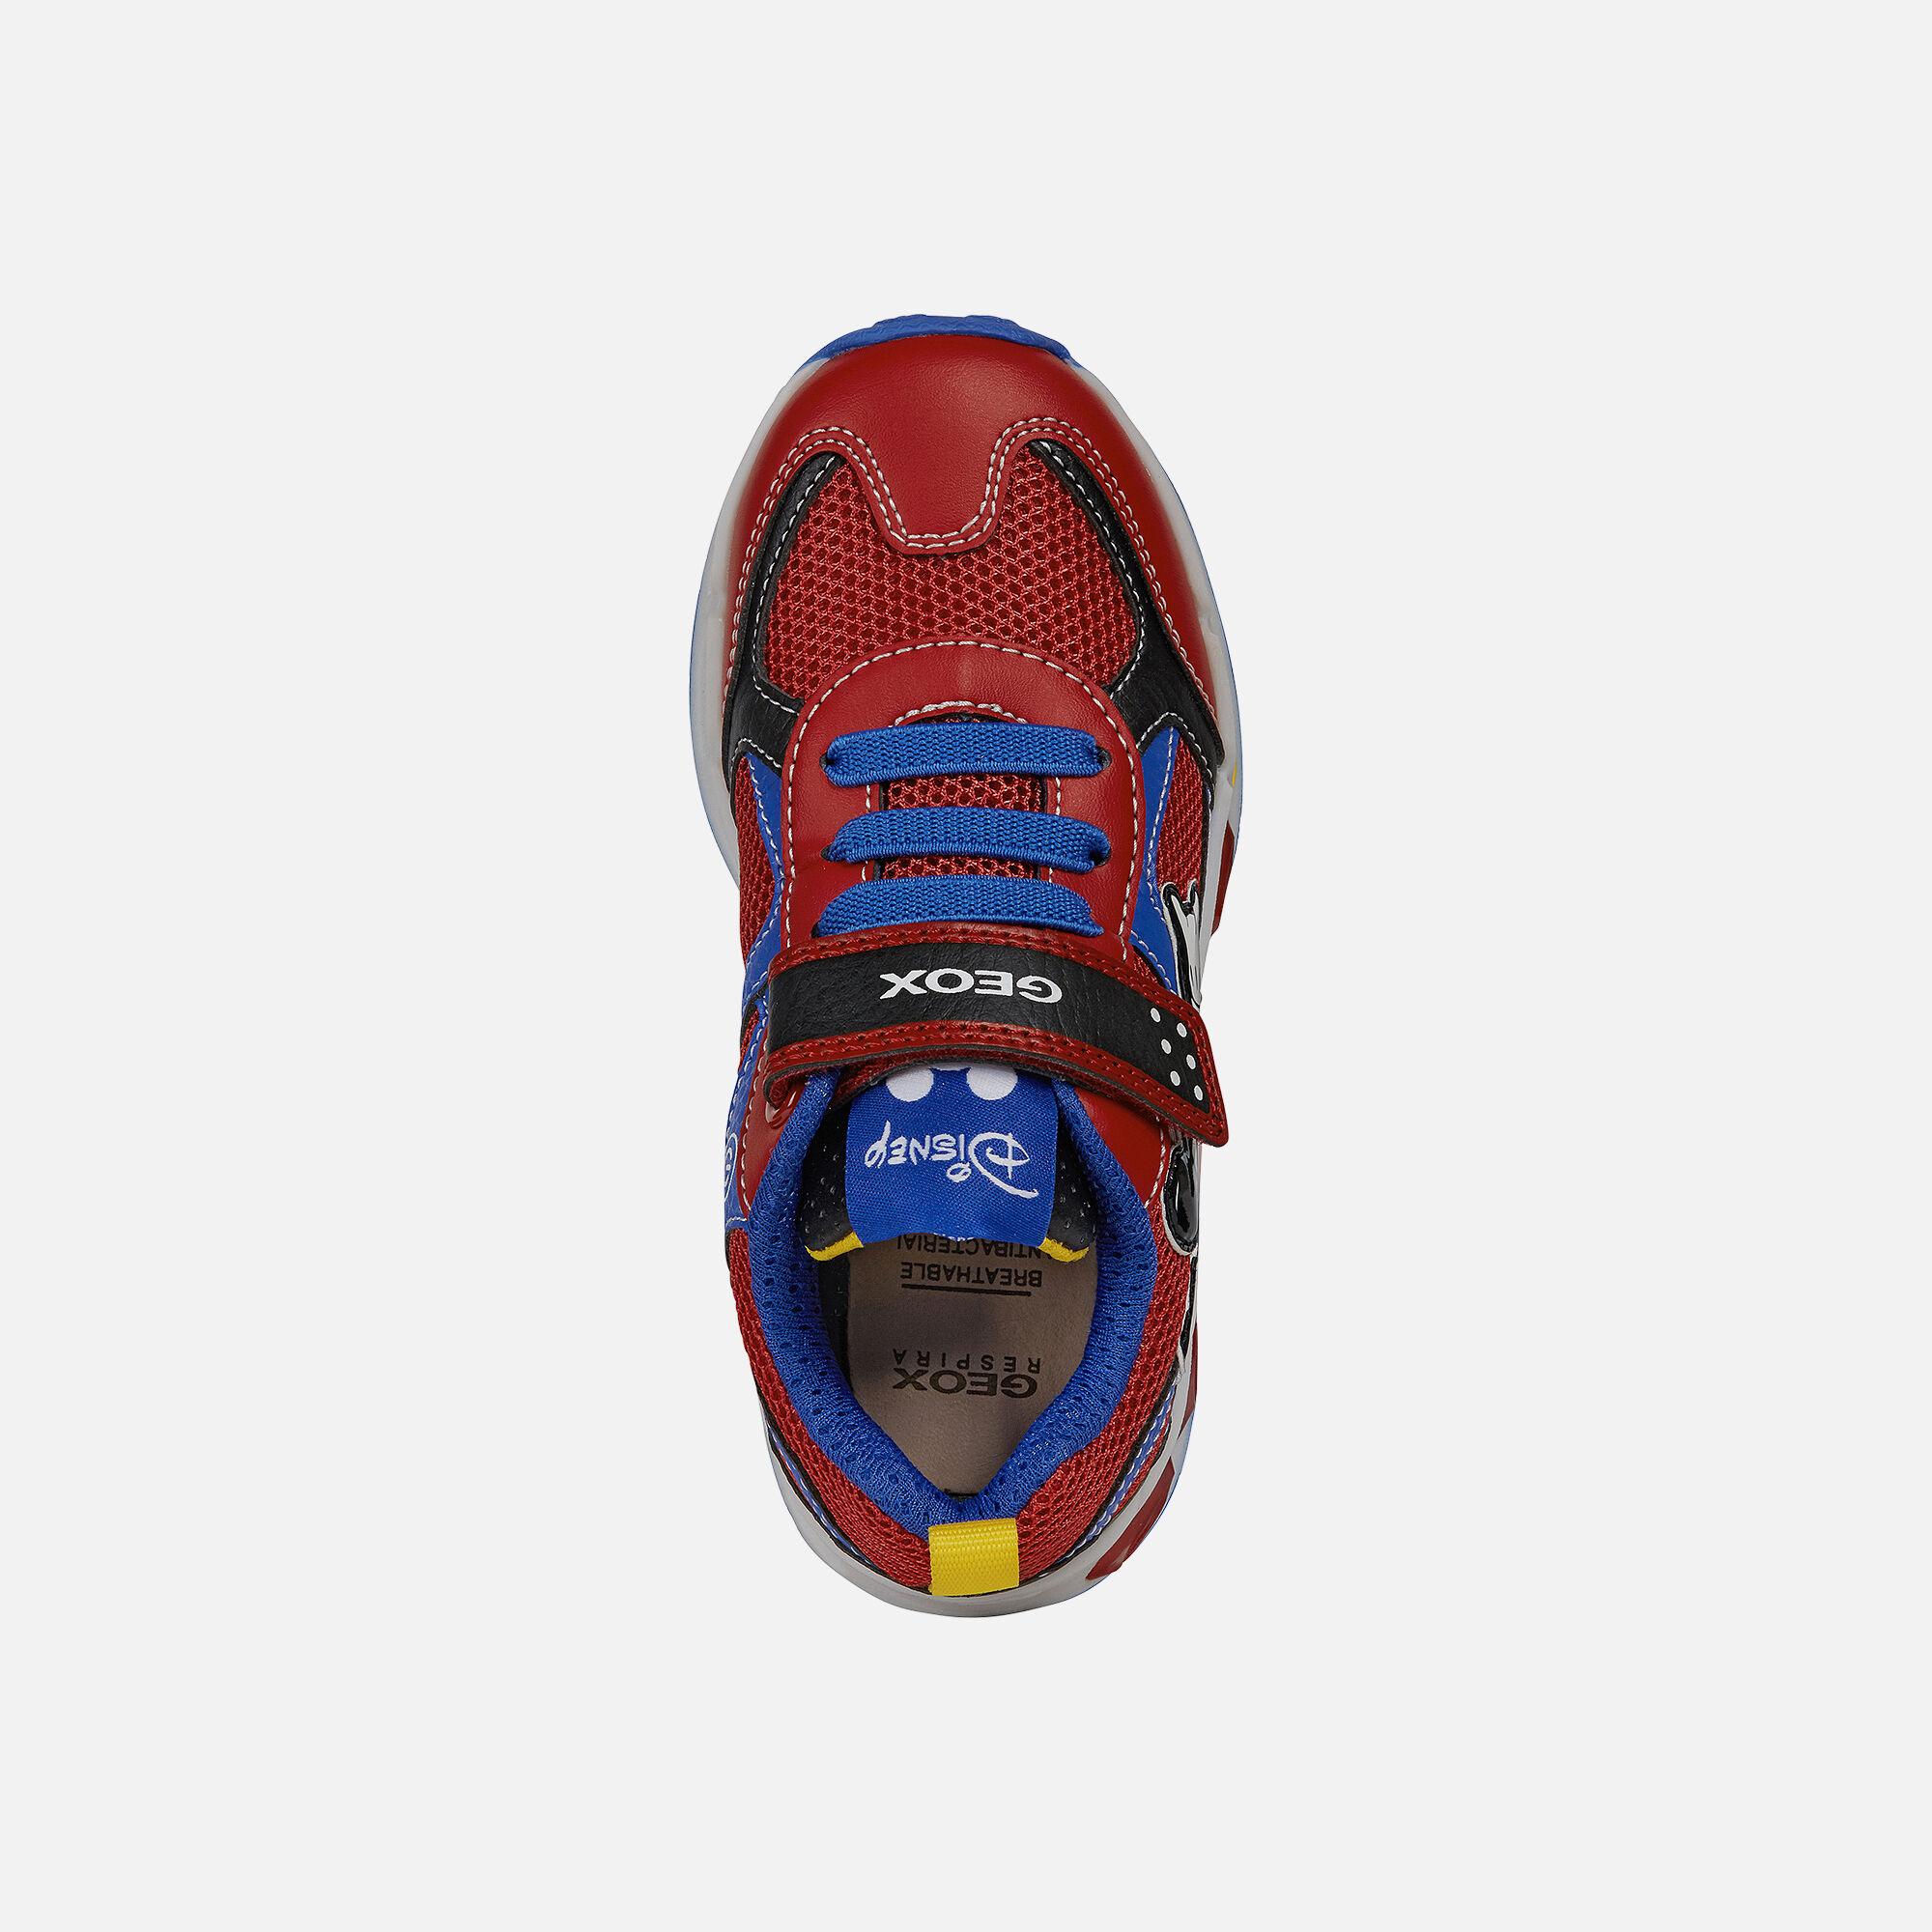 Geox sneaker jr boy shuttle luci chiusura doppio strap